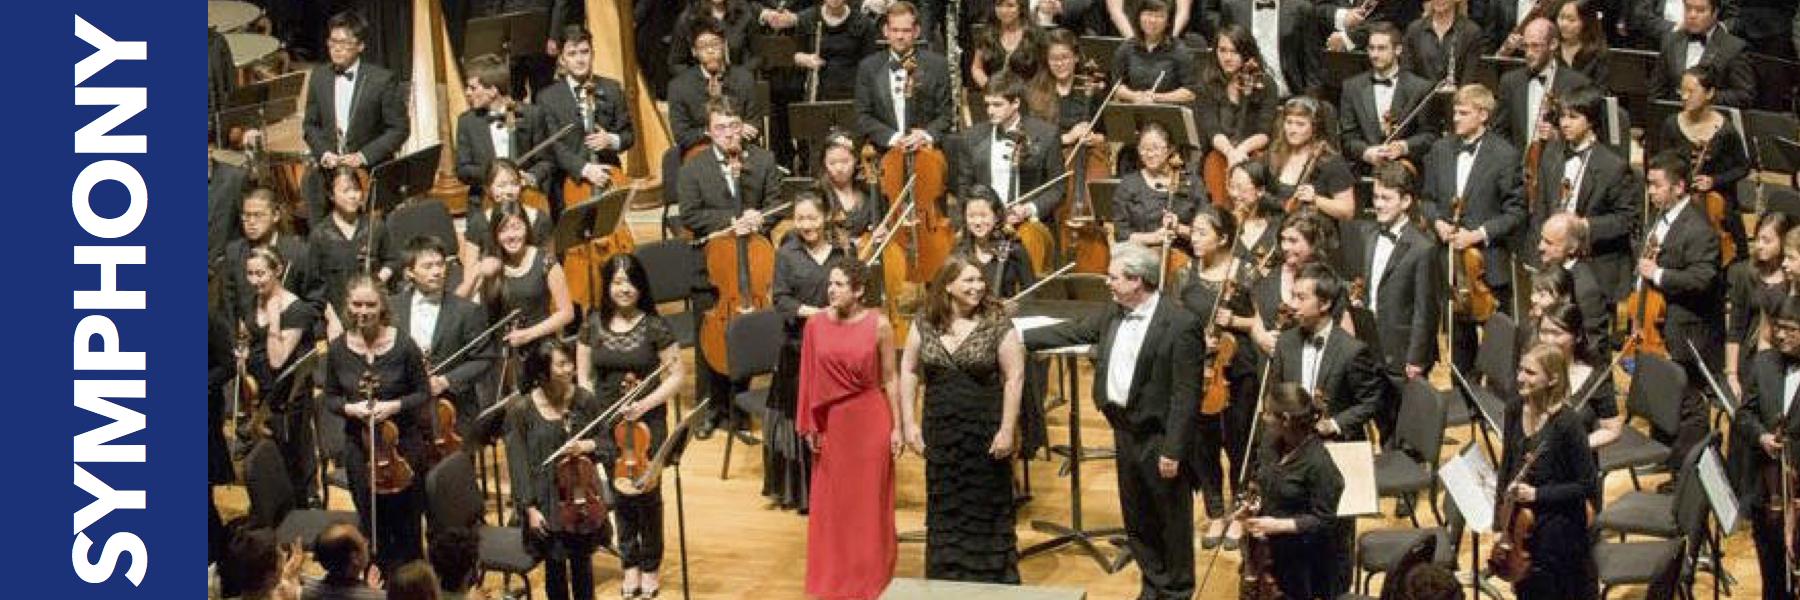 UCBSO Symphony.jpg